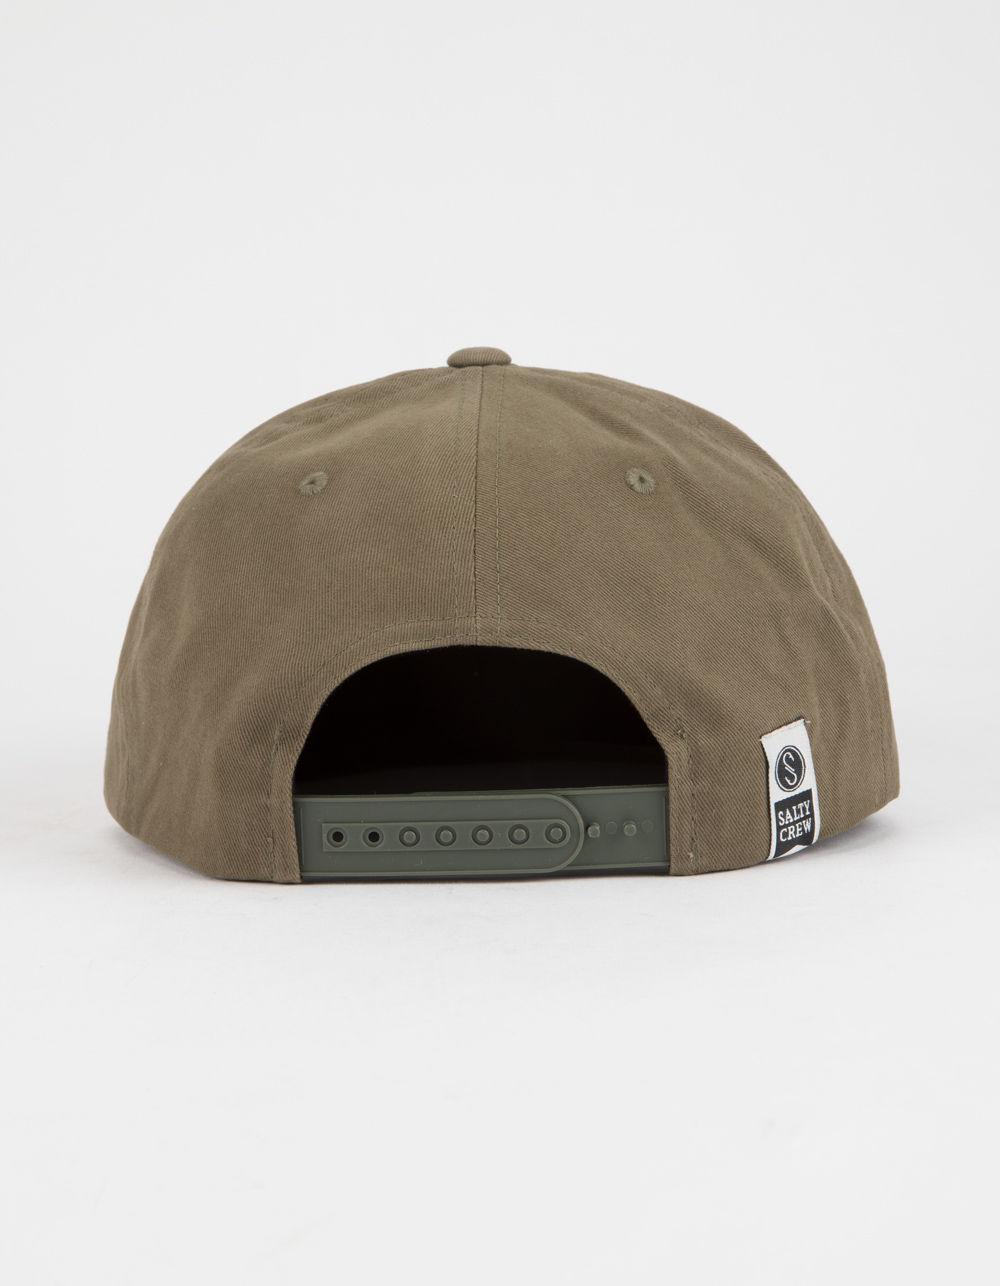 wholesale dealer 0ae36 04e46 ... release date lyst salty crew mahi mount mens snapback hat in green for  men 0d922 93702